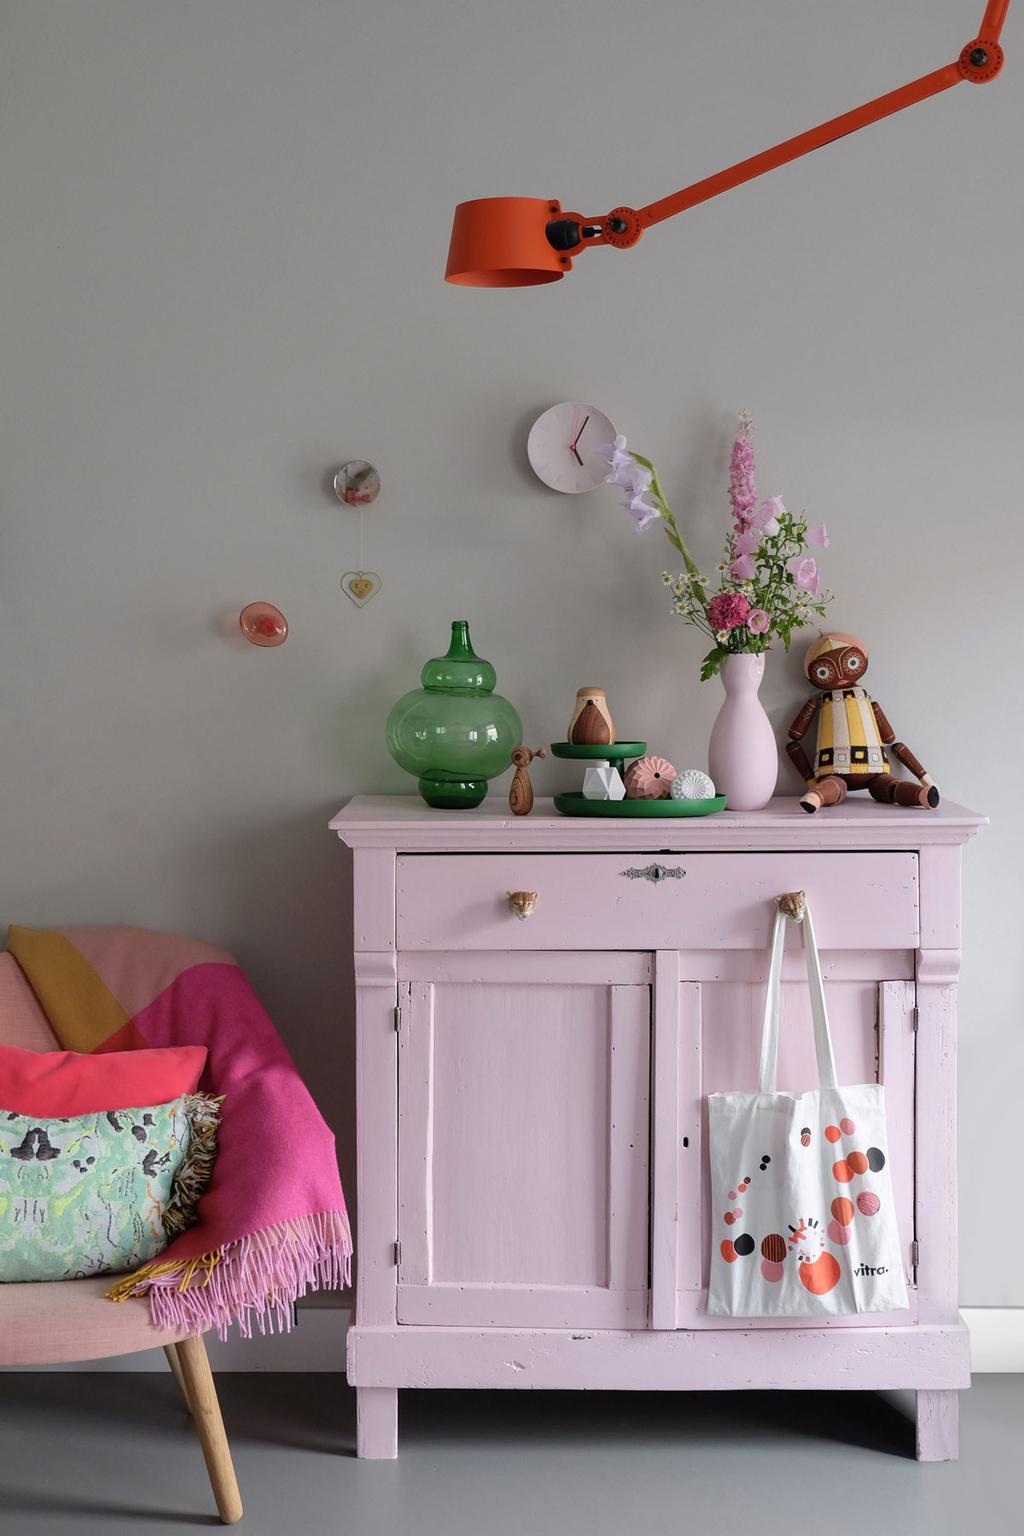 Leeslamp Tonone boven roze kastje